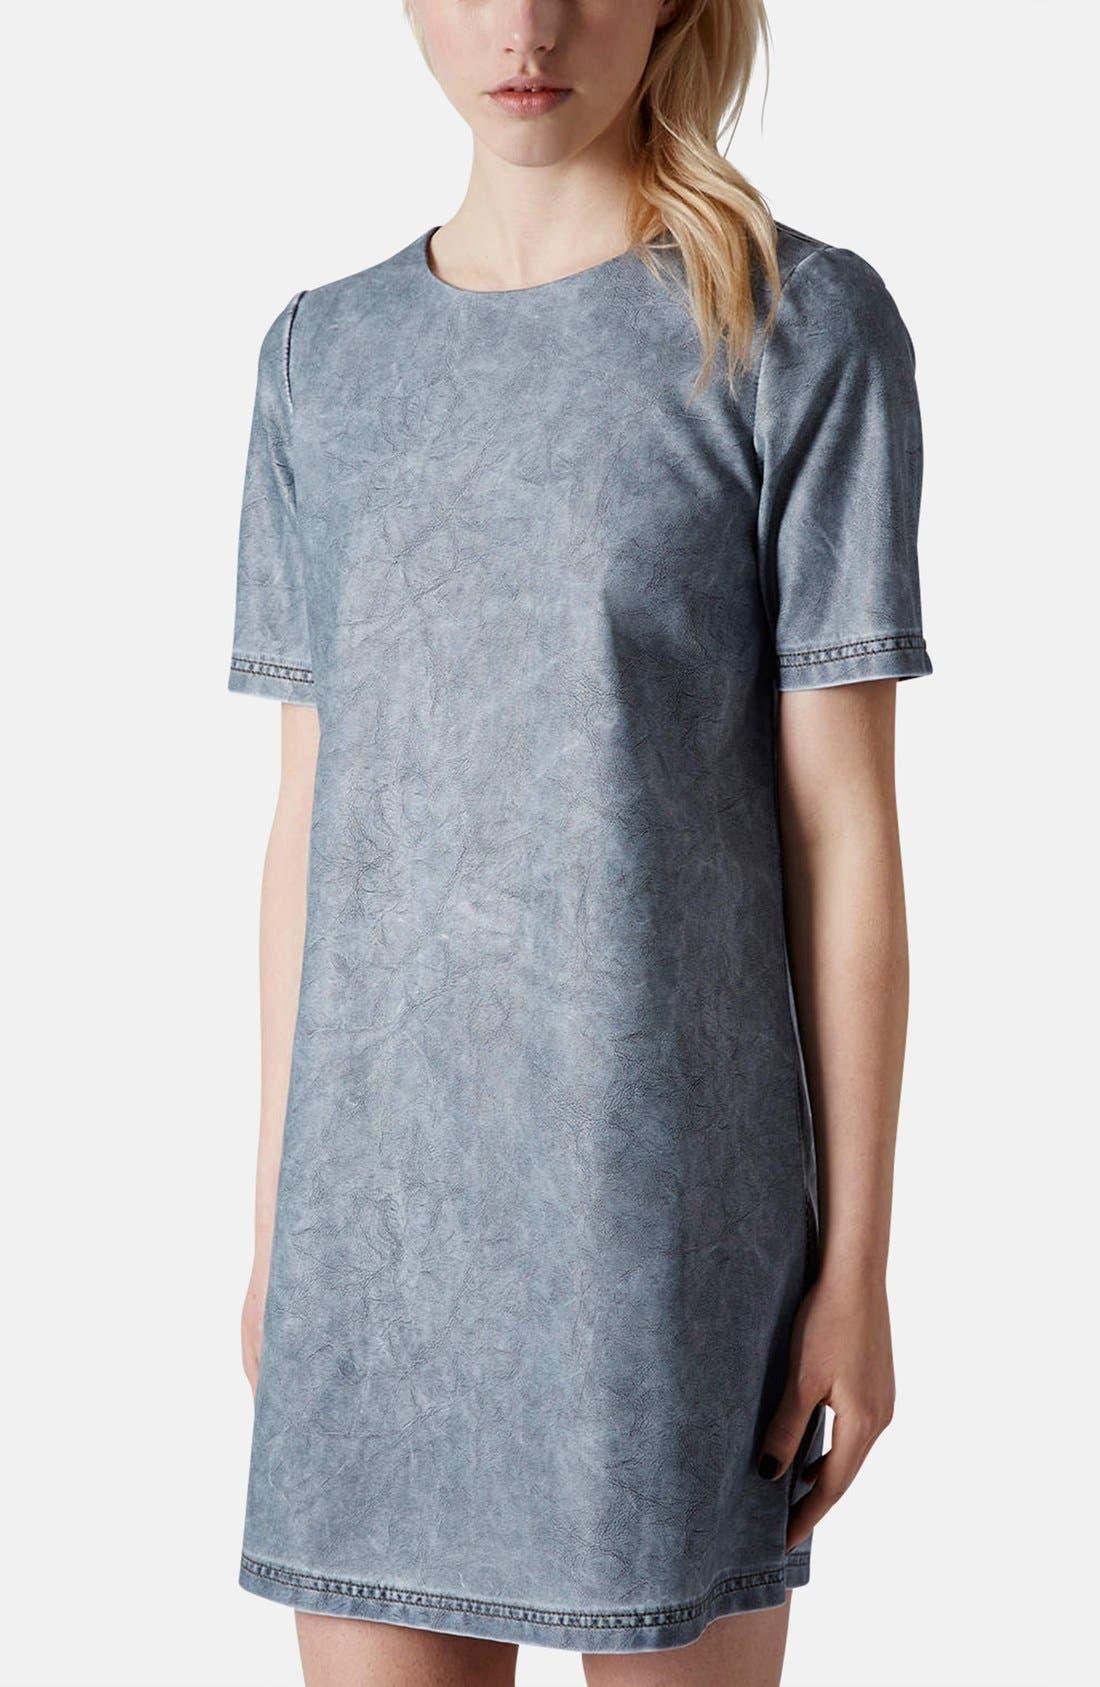 Alternate Image 1 Selected - Topshop 'Daloma' Faux Leather Shift Dress